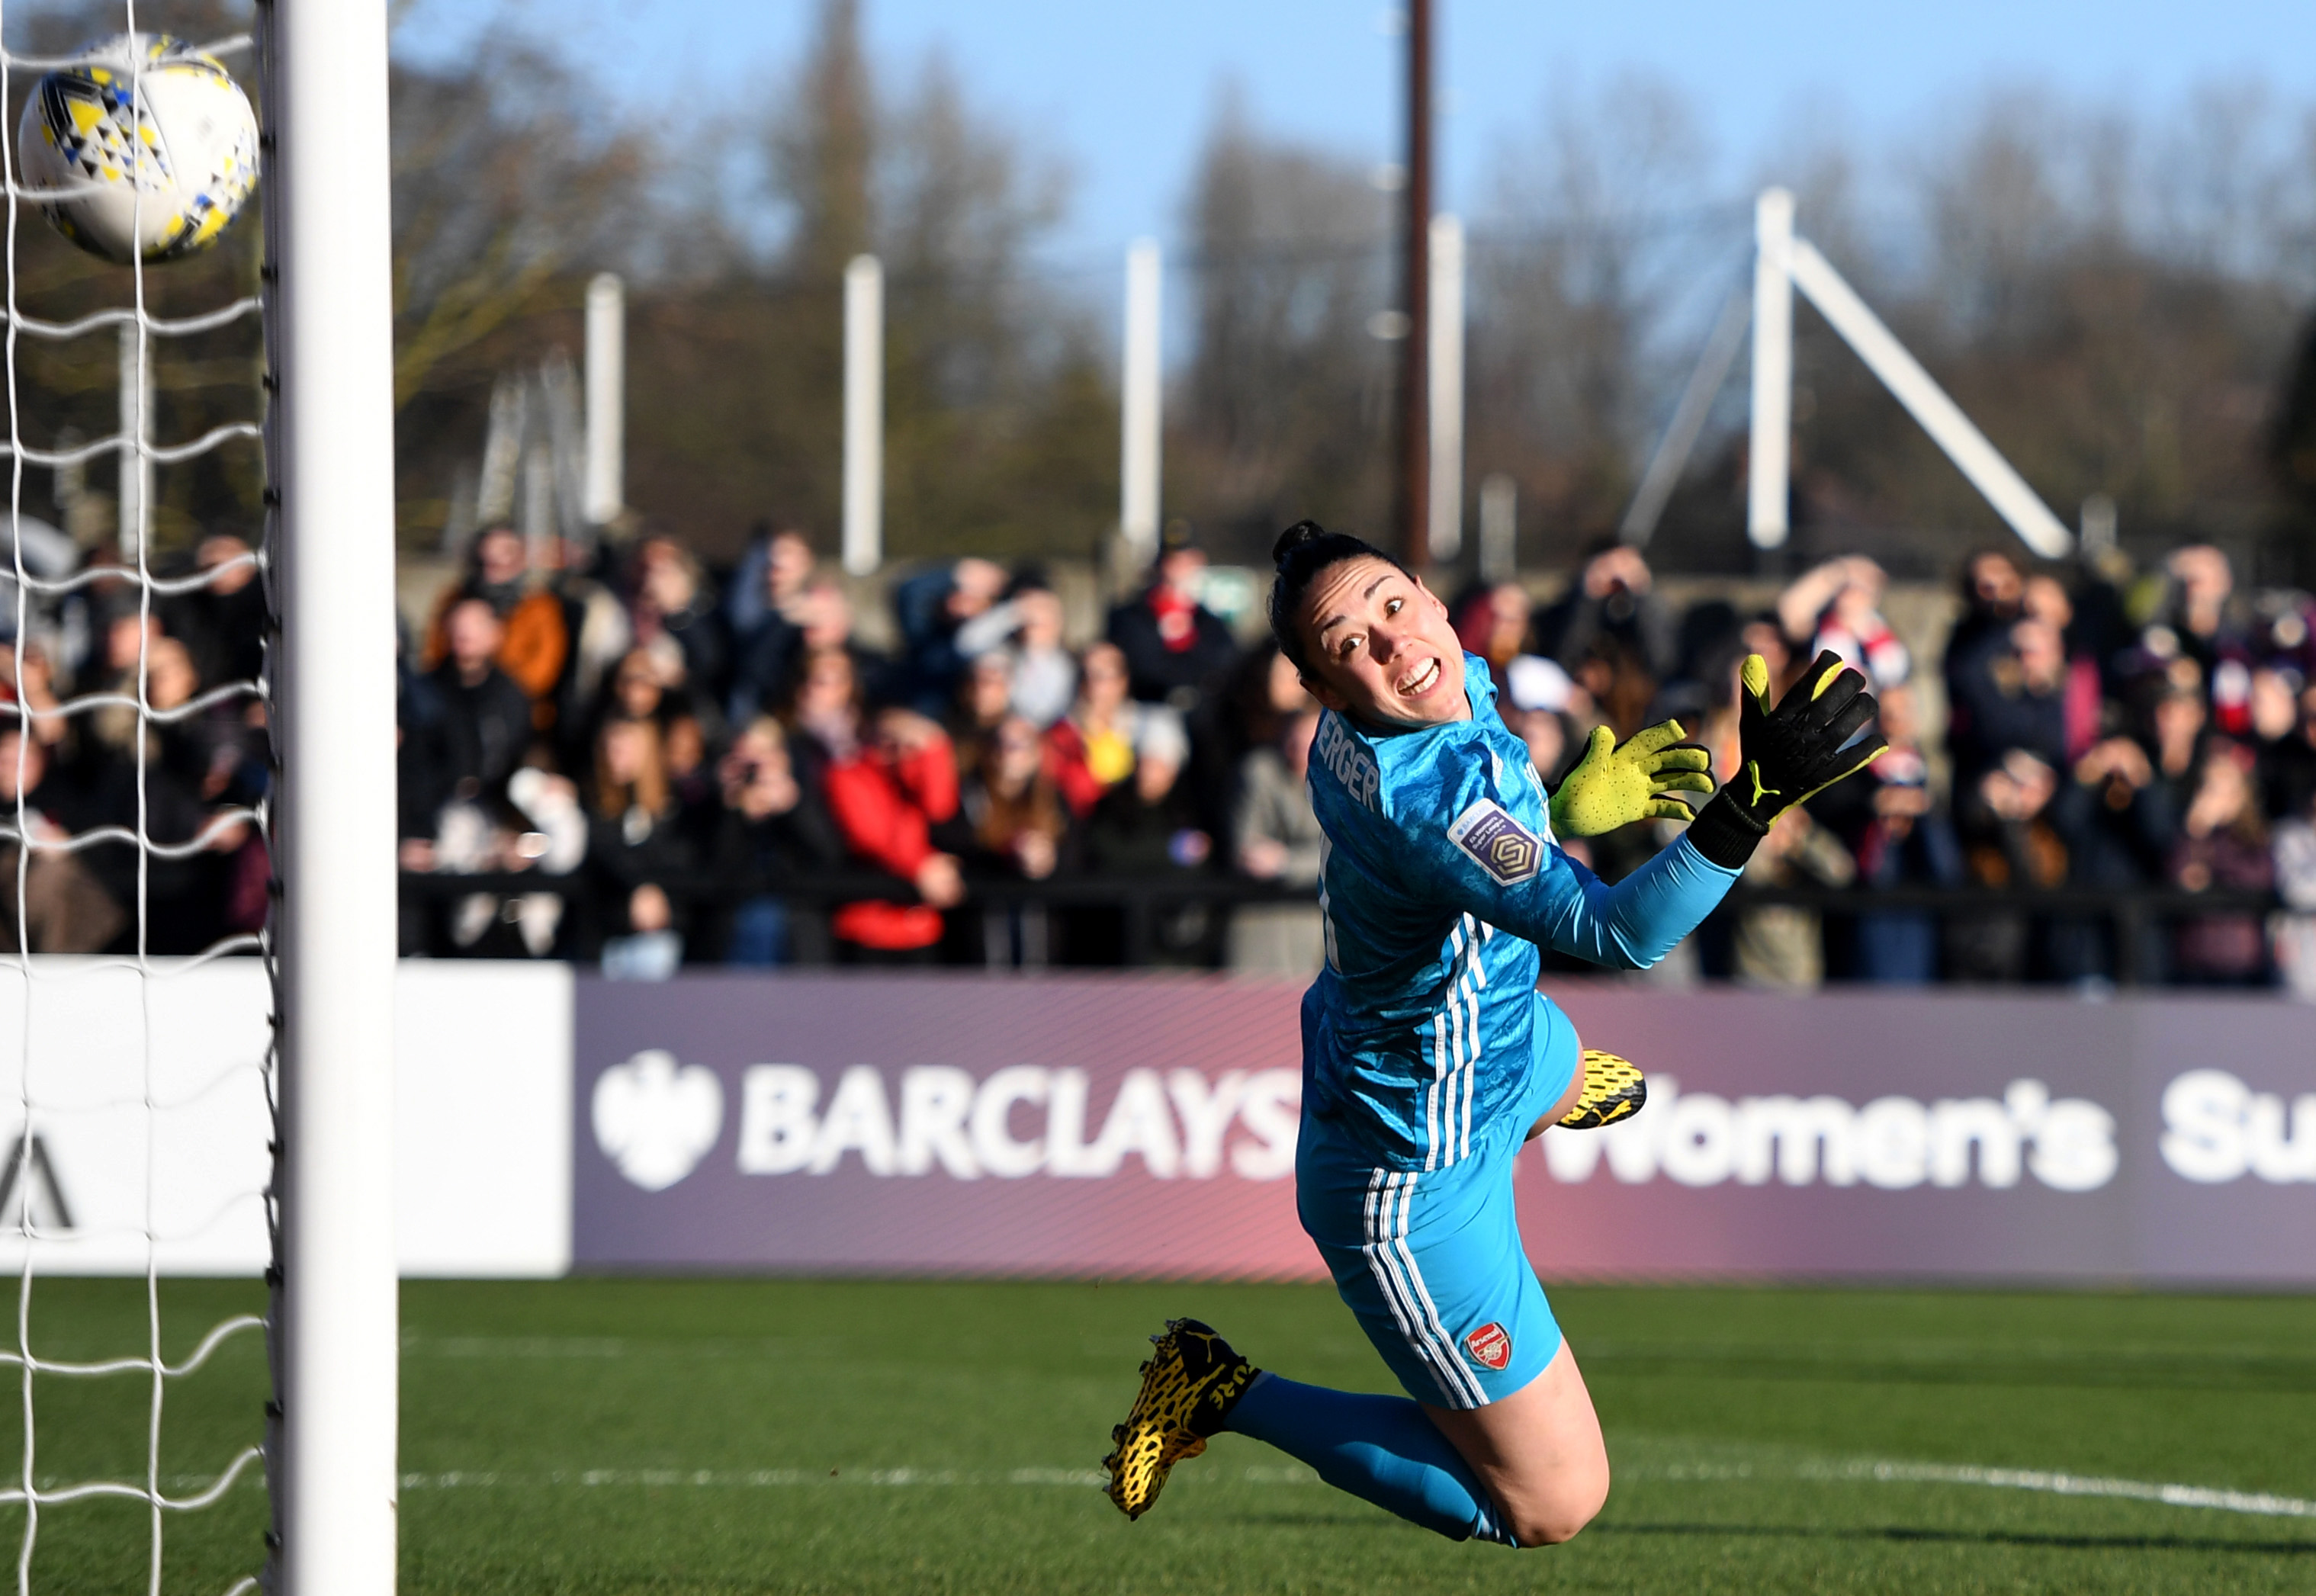 Arsenal v Chelsea - Barclays FA Women's Super League